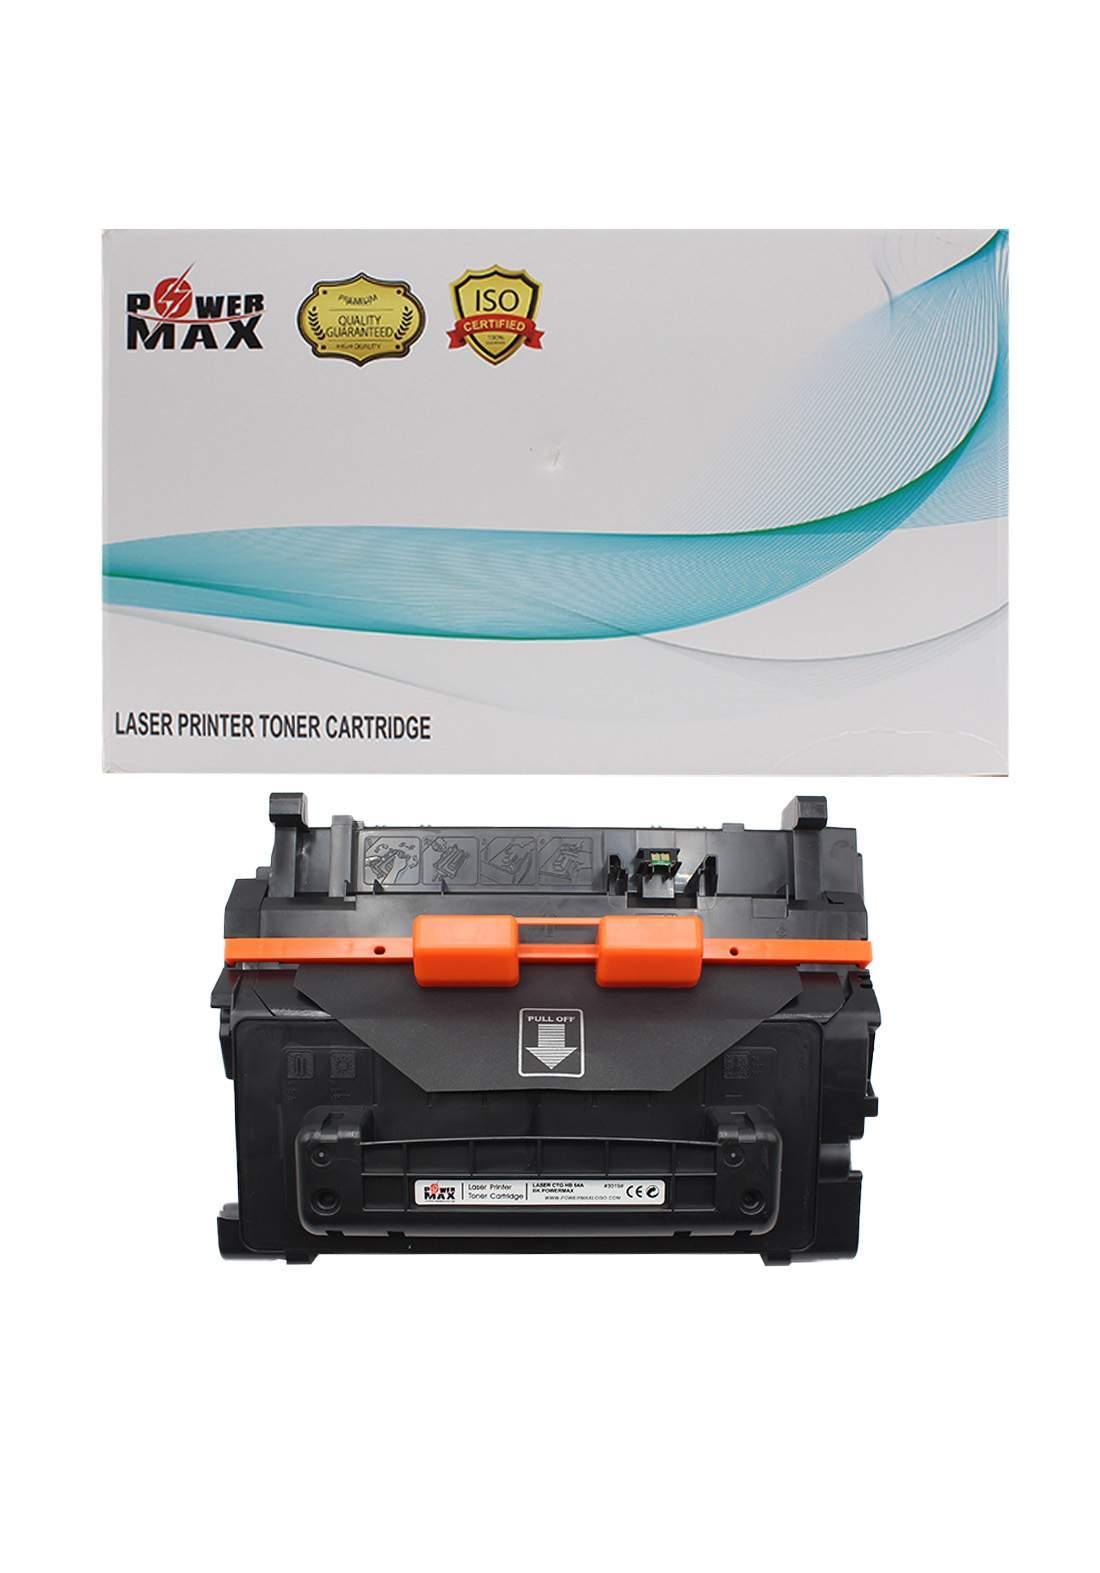 Power Max CTG HP 64A Laser Printer Toner Cartridge خرطوشة حبر